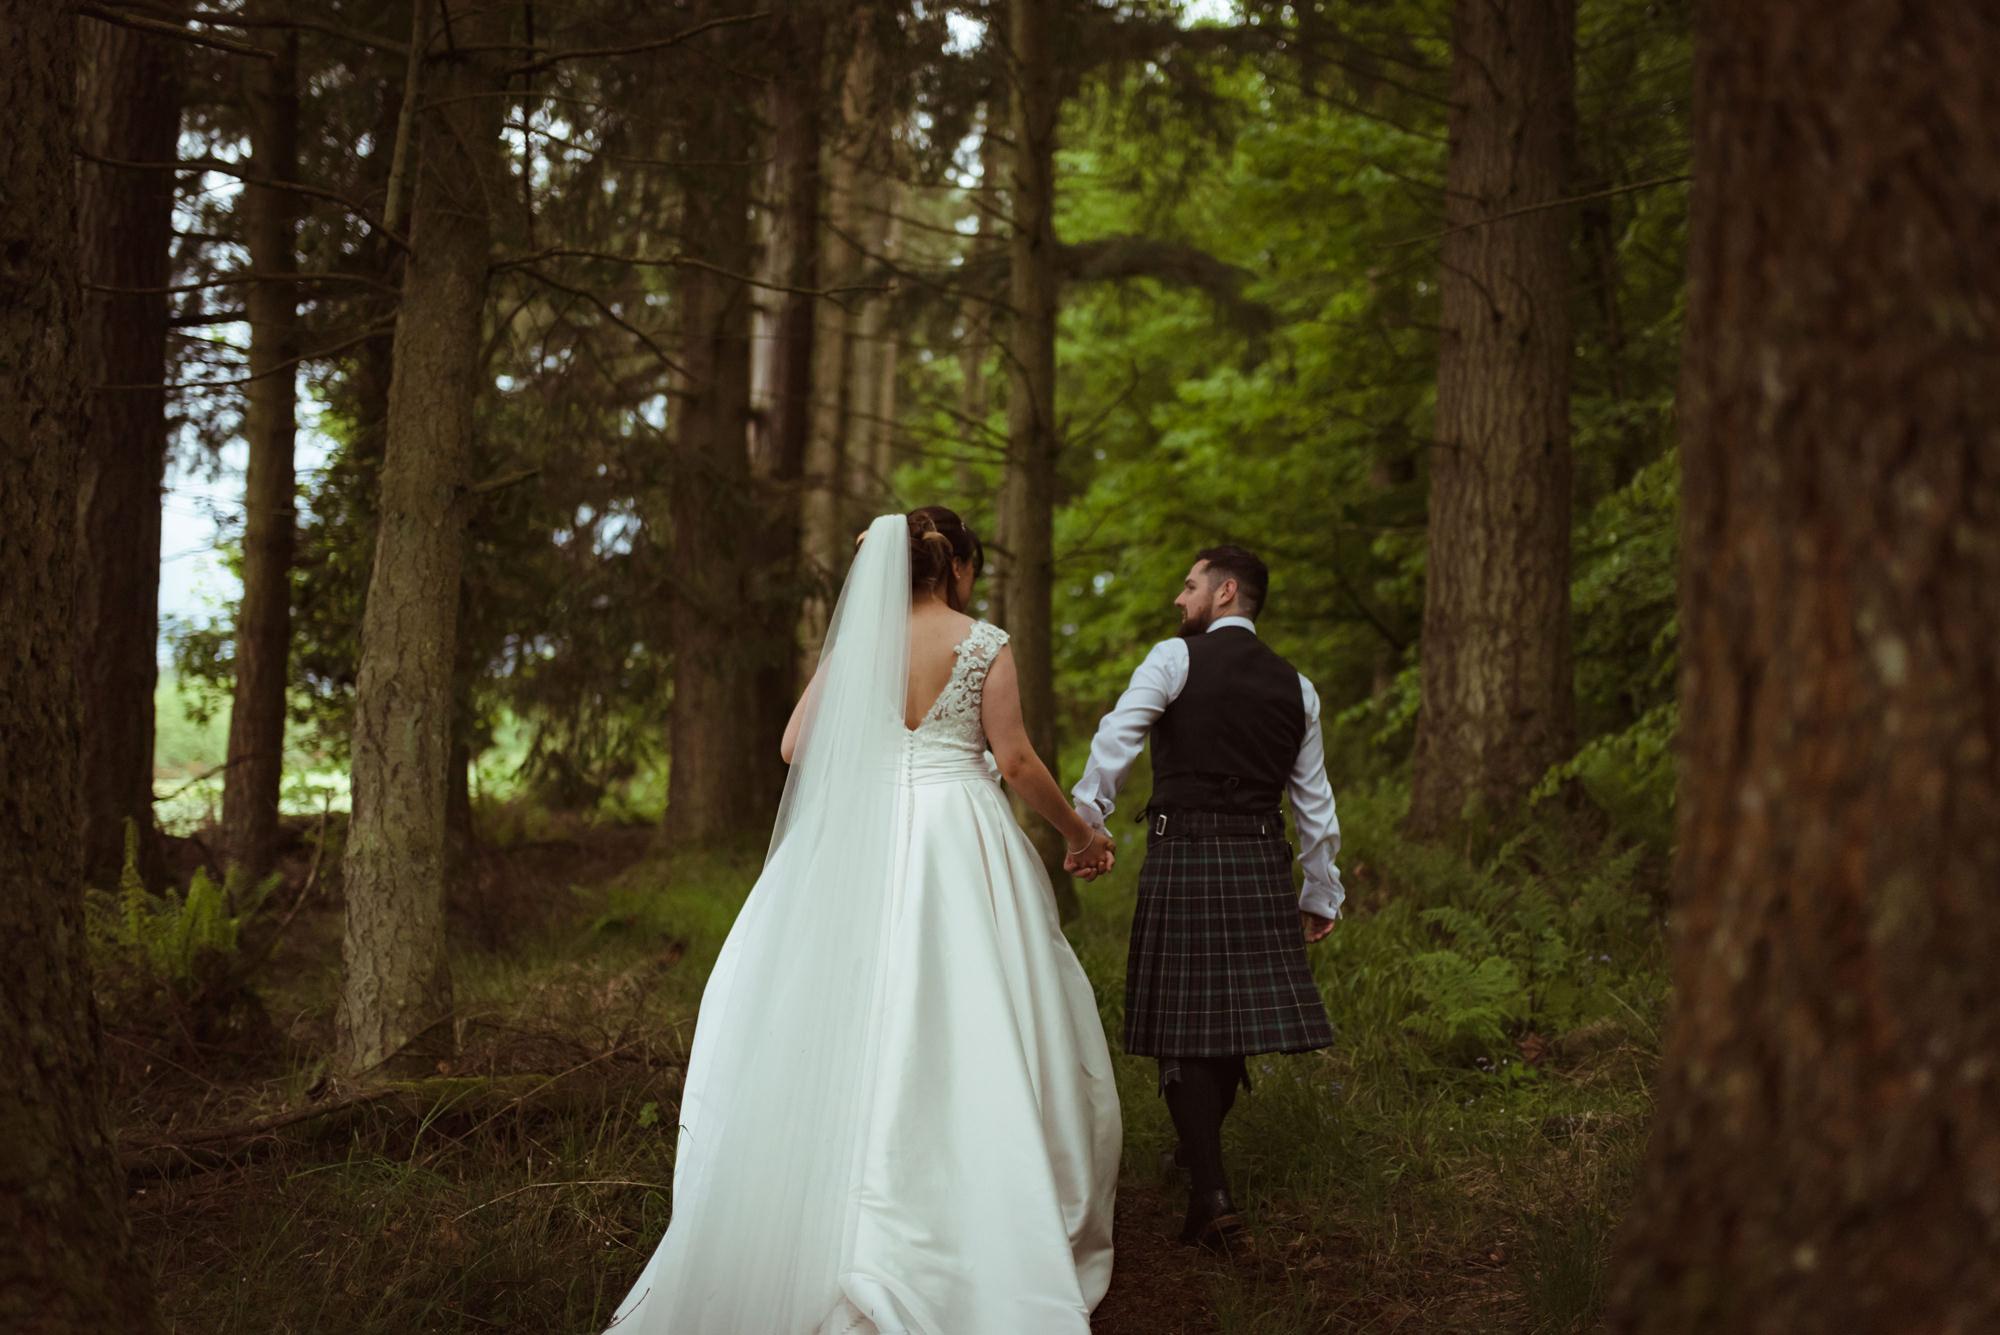 country-wedding-venue-scotland.jpg